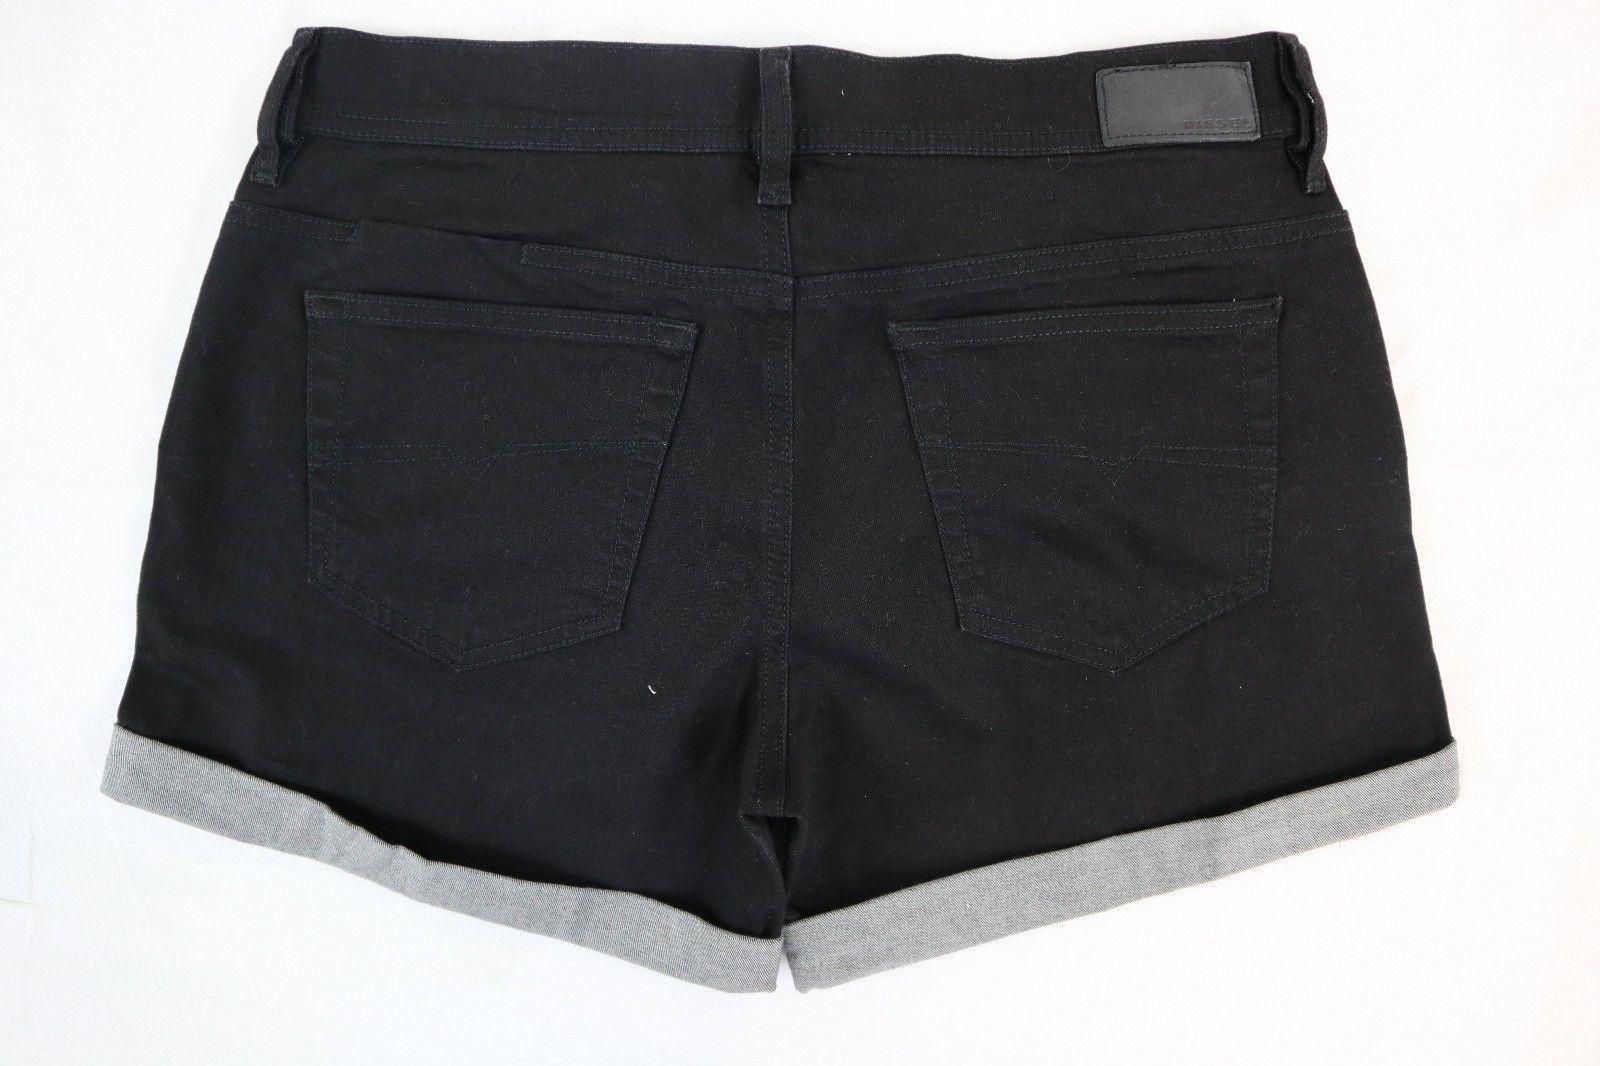 NWT DIESEL Women's Black Alaisi Stretch Cuffed Denim Jean Shorts 29 x 4